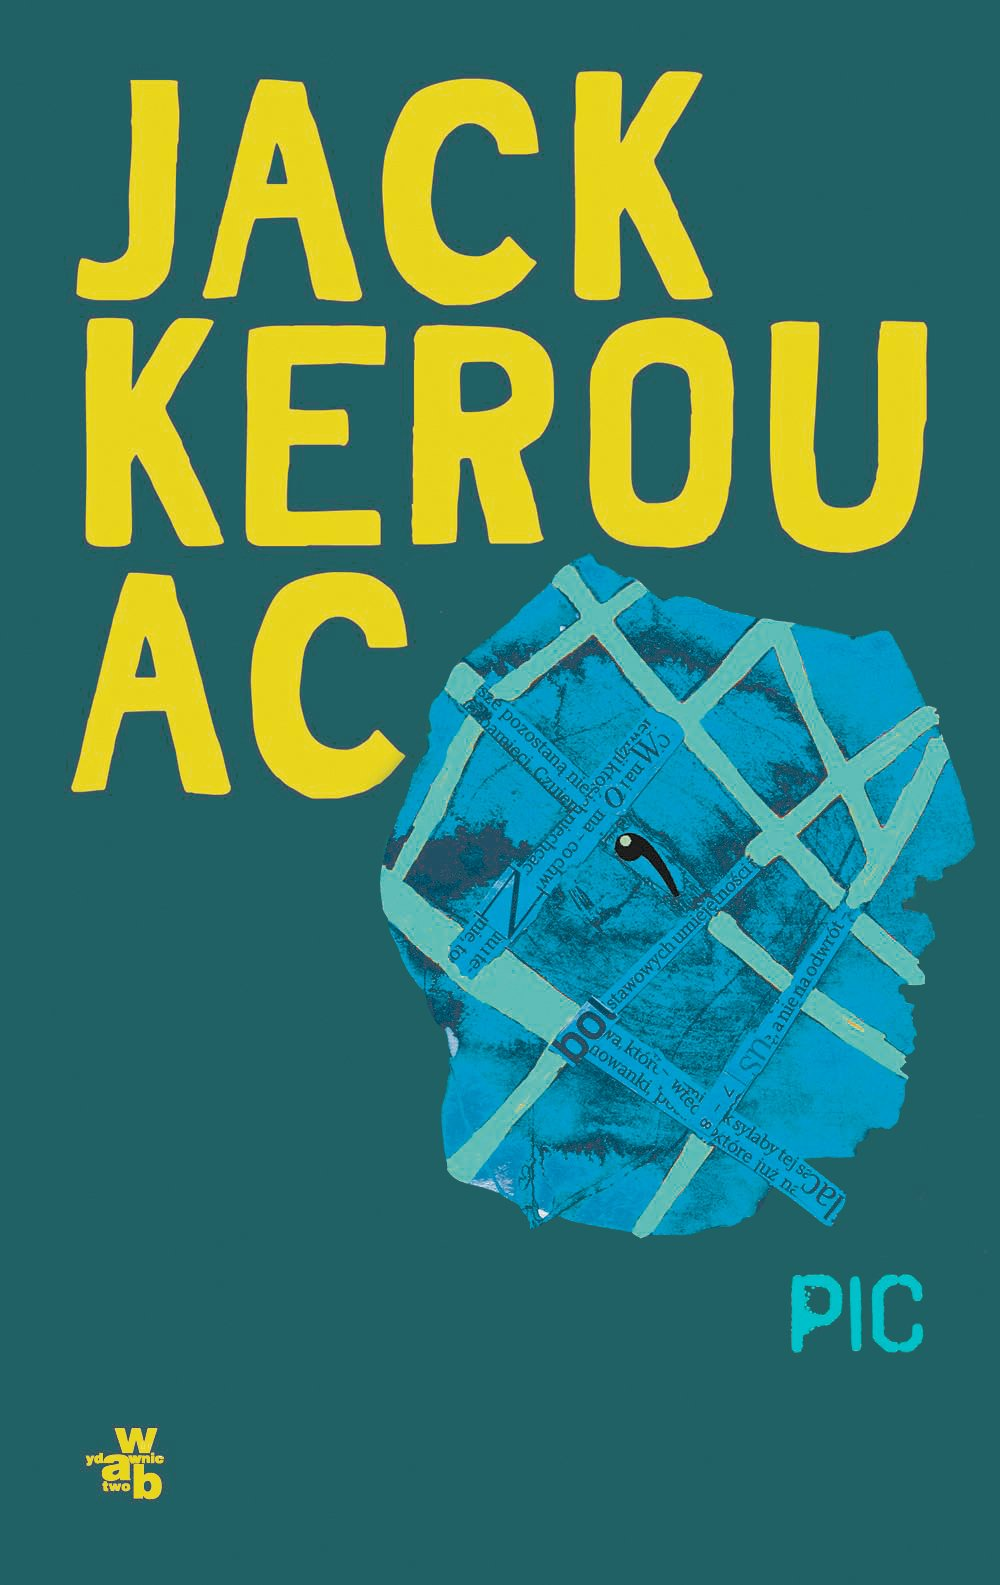 Pic - Jack Kerouac